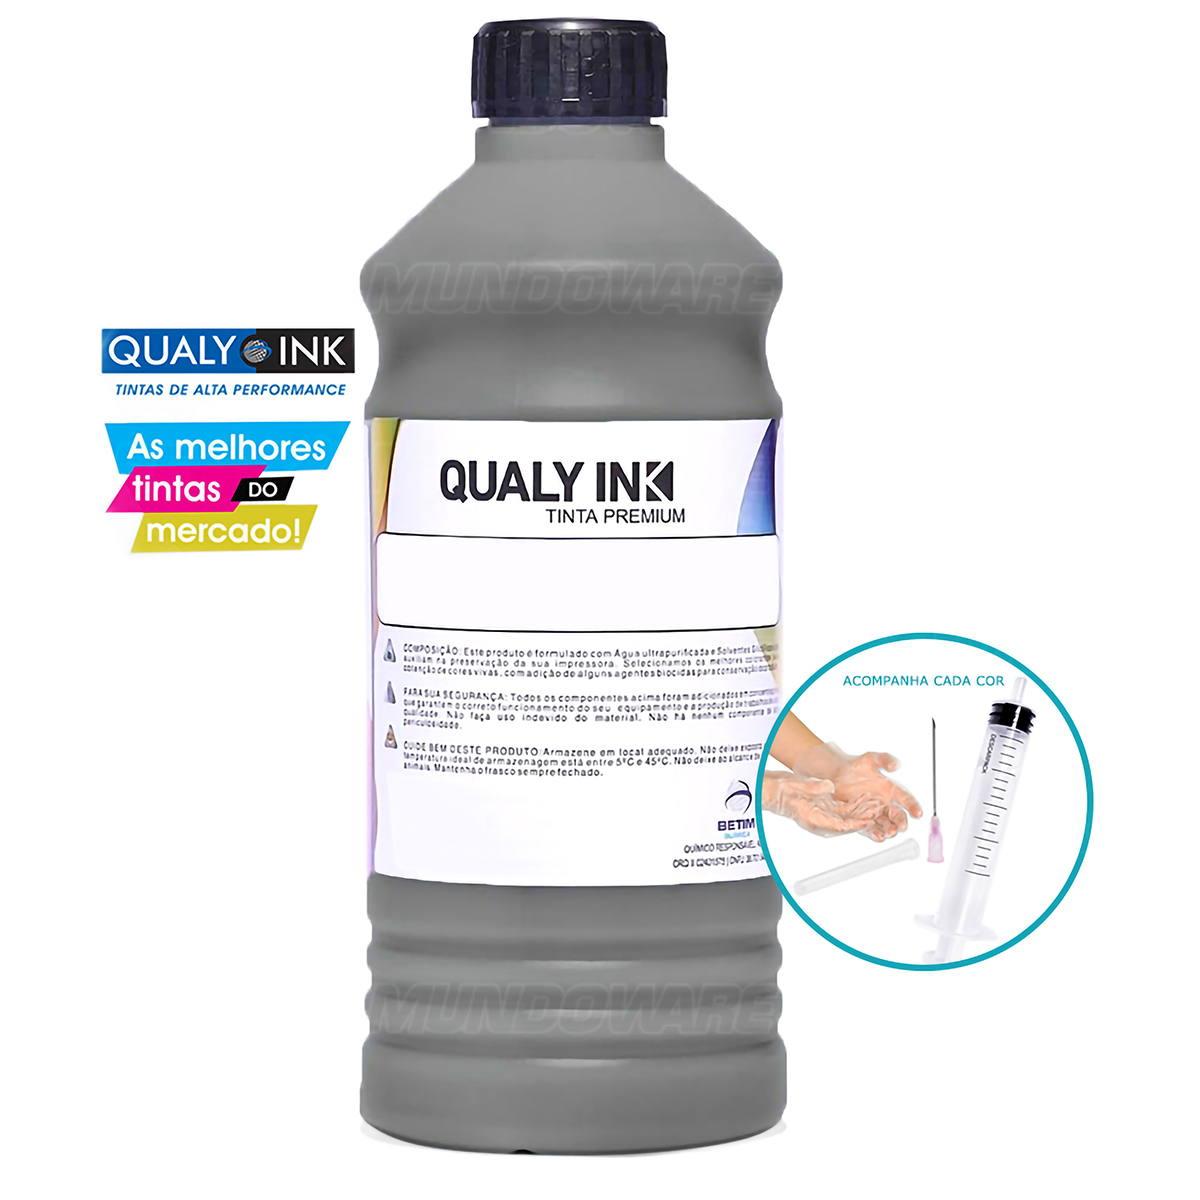 Compatível: Tinta Corante Qualy-Ink BC3E-1509 Série 664 para Epson L200 L355 L365 L375 L395 L565 L575 Preto 1L